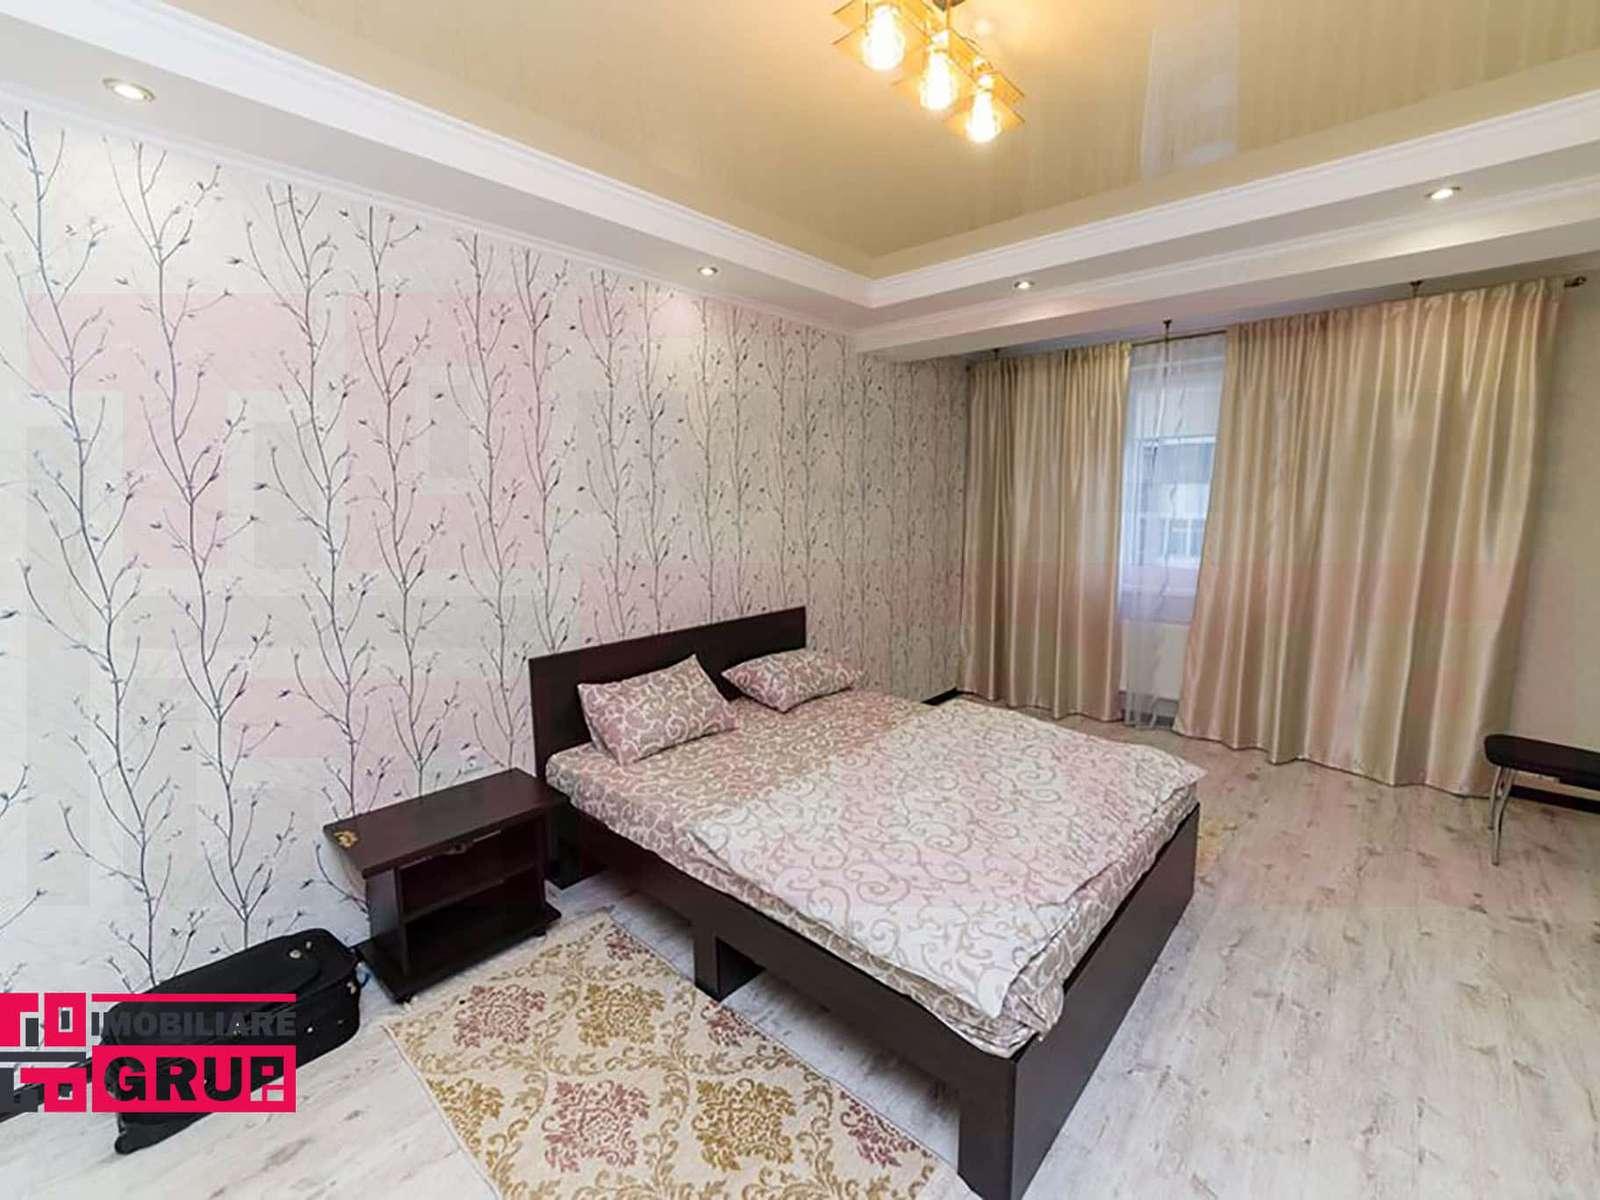 Apartament de lux cu 3 camere, Ultracentral